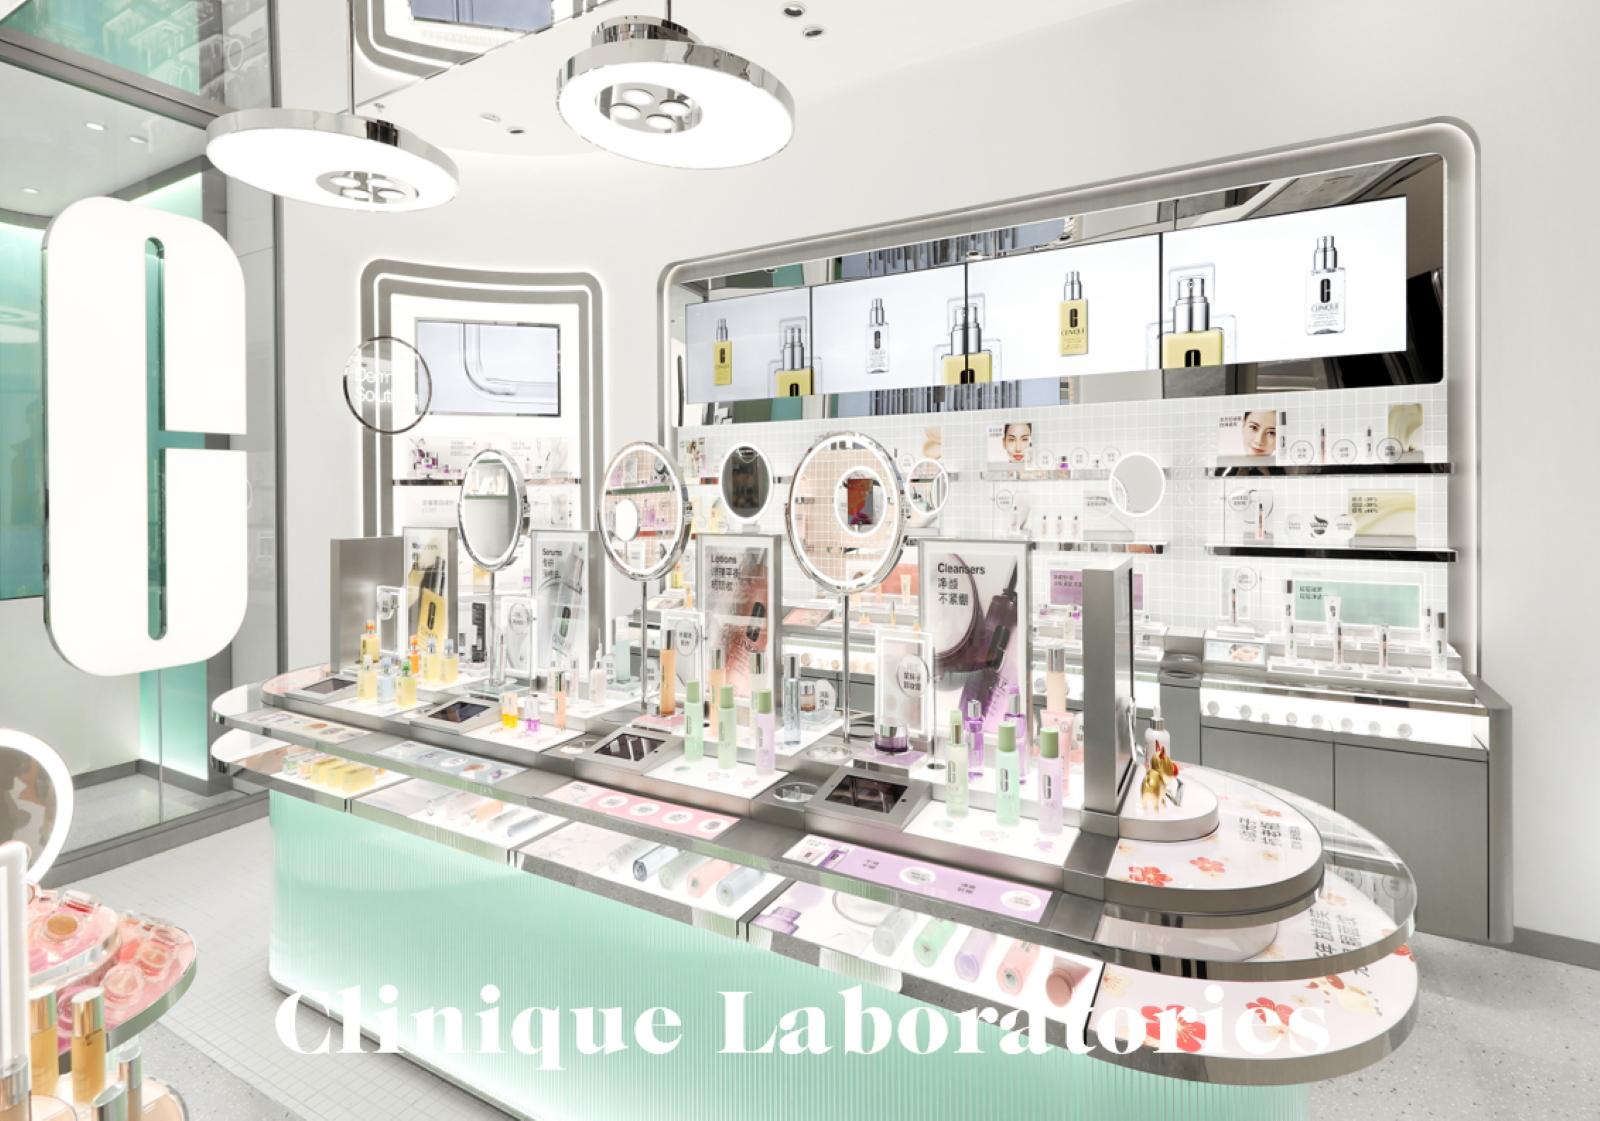 Clinique laboratories innovation tour missions mmm 0